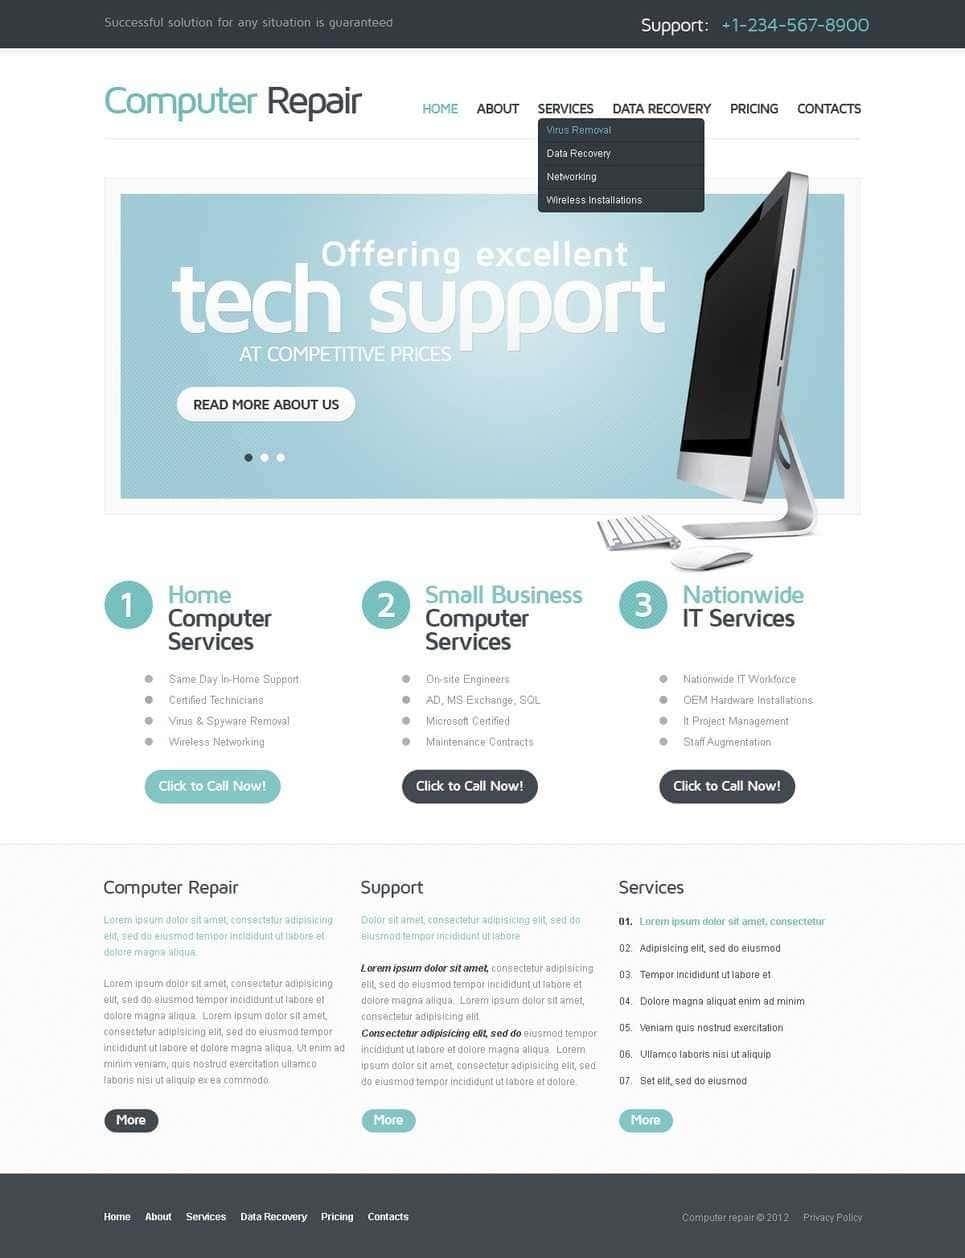 Computer Repair Flyer Template Free Download